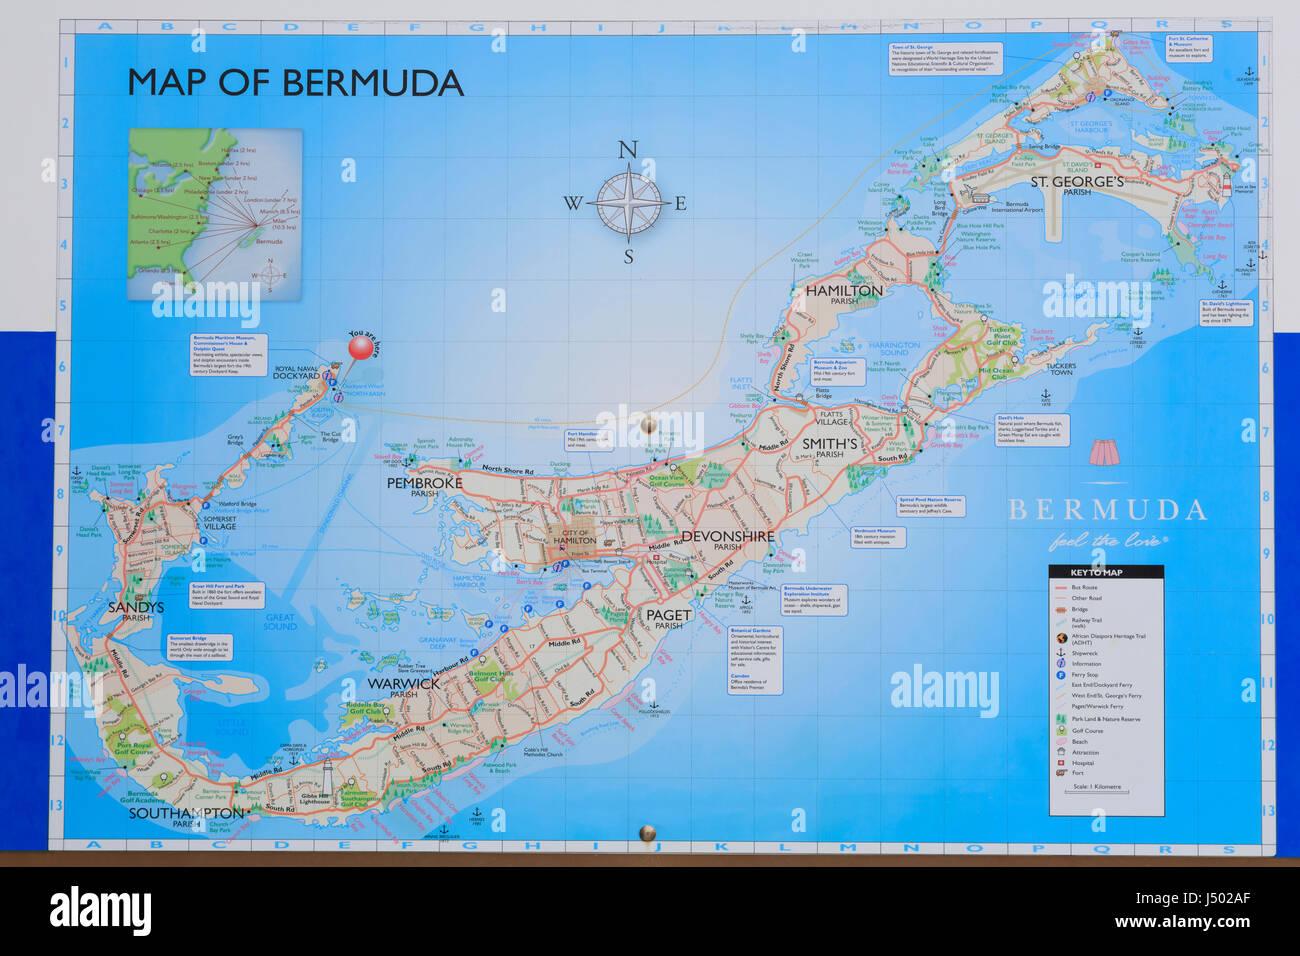 Map Bermuda Stockfotos & Map Bermuda Bilder - Alamy